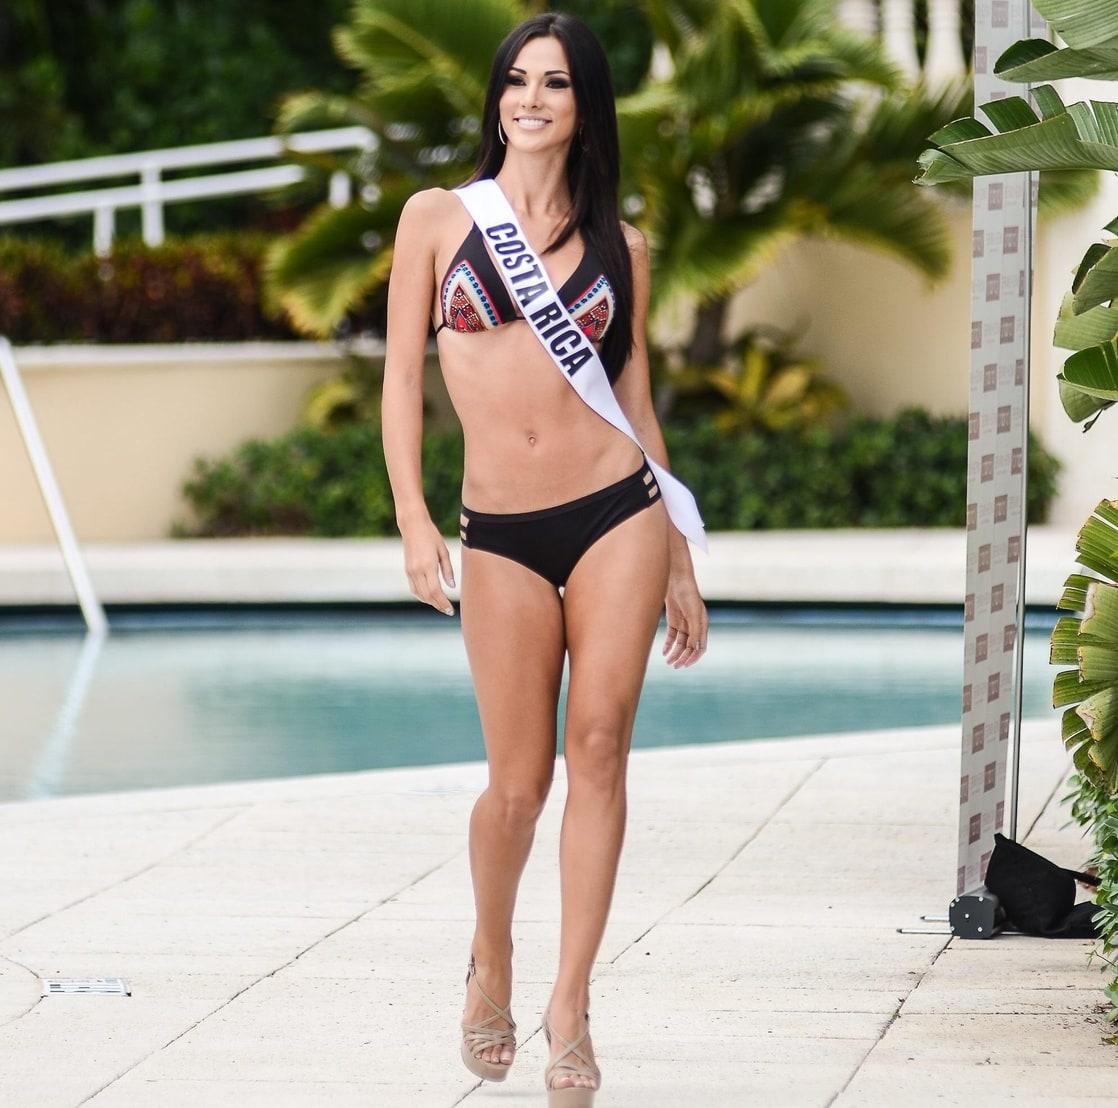 Hot Karina Ramos nude (82 photos), Pussy, Bikini, Instagram, in bikini 2020